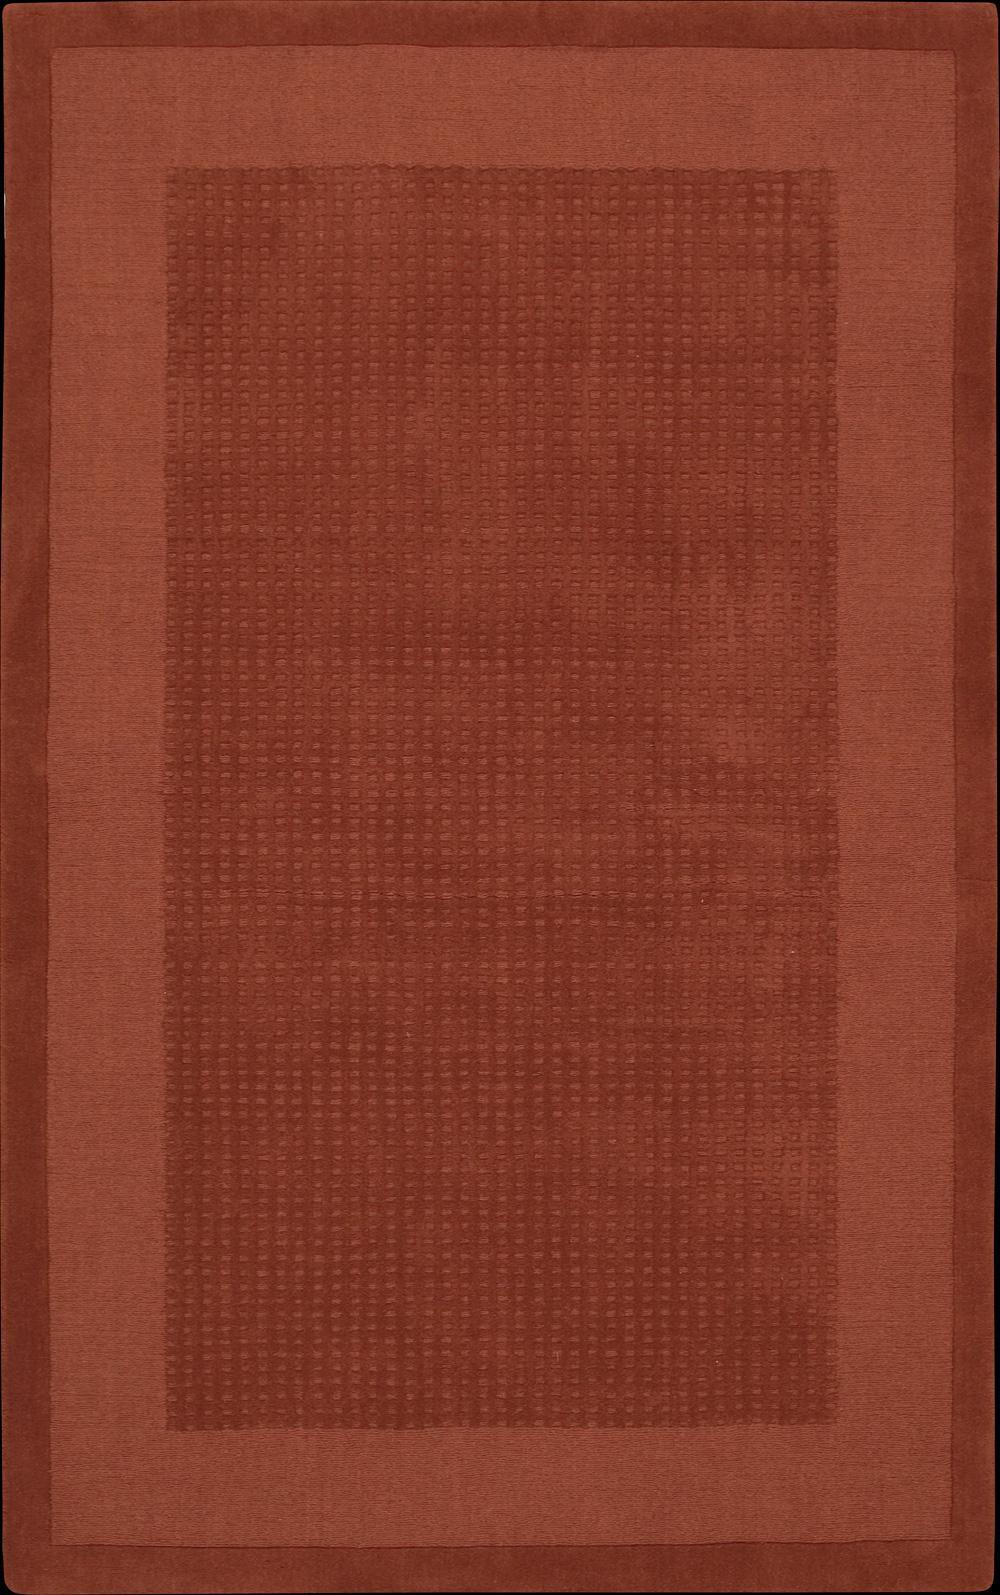 Nourison Westport Area Rug 5' x 8' - Item Number: 72375